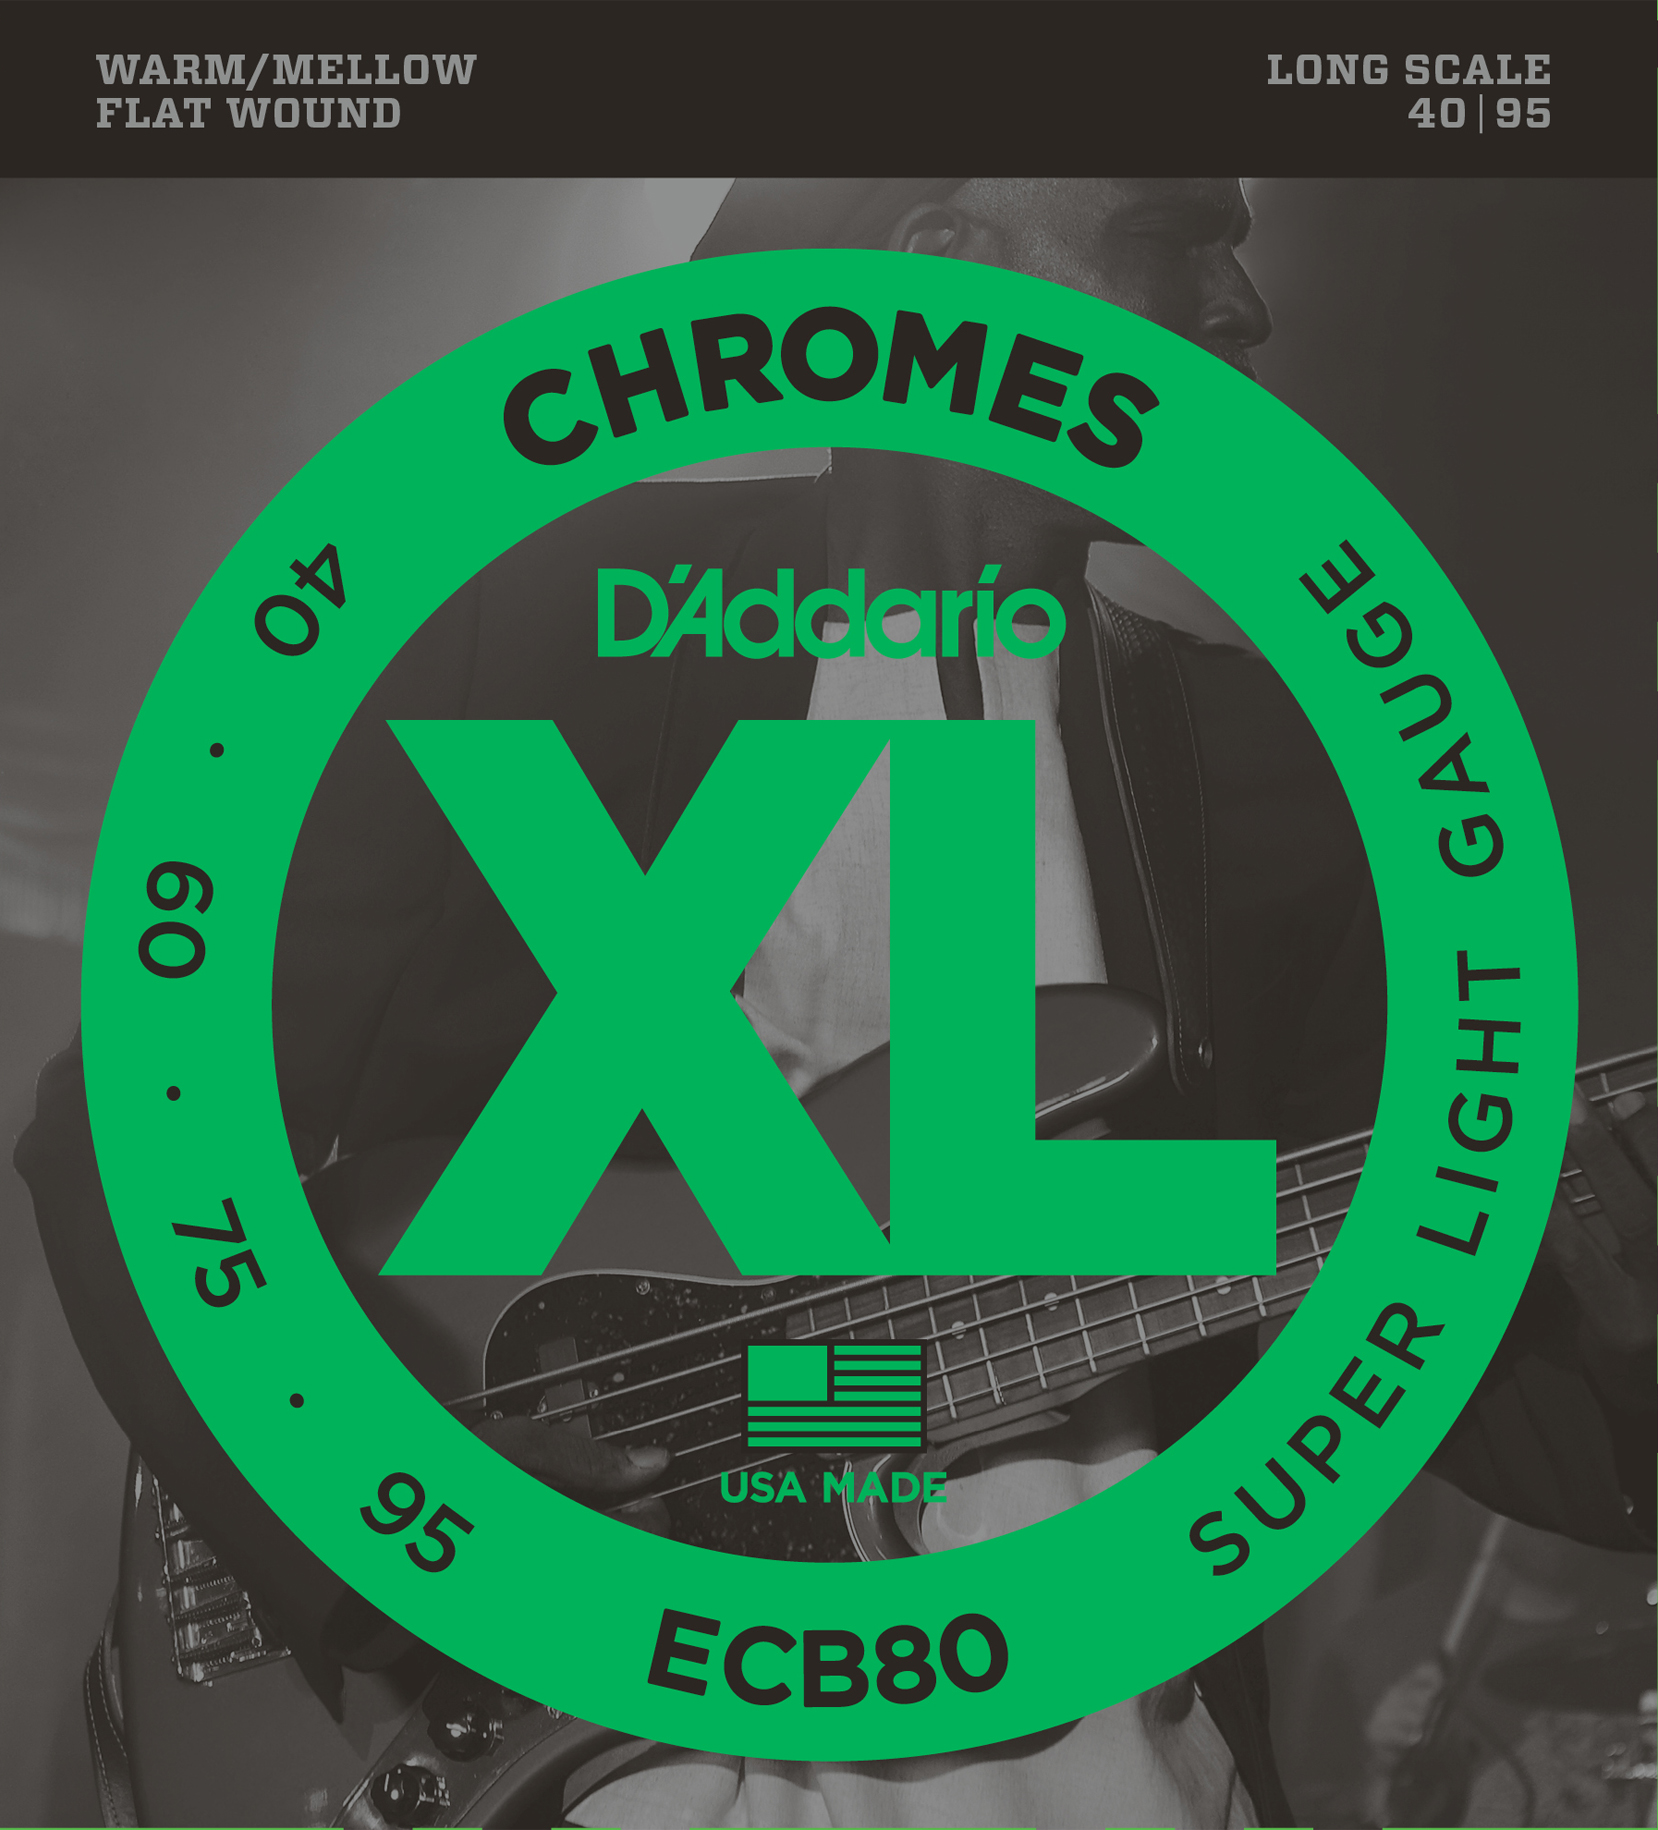 D'Addario ECB80 Bass Guitar Strings Light 40-95 Long Scale